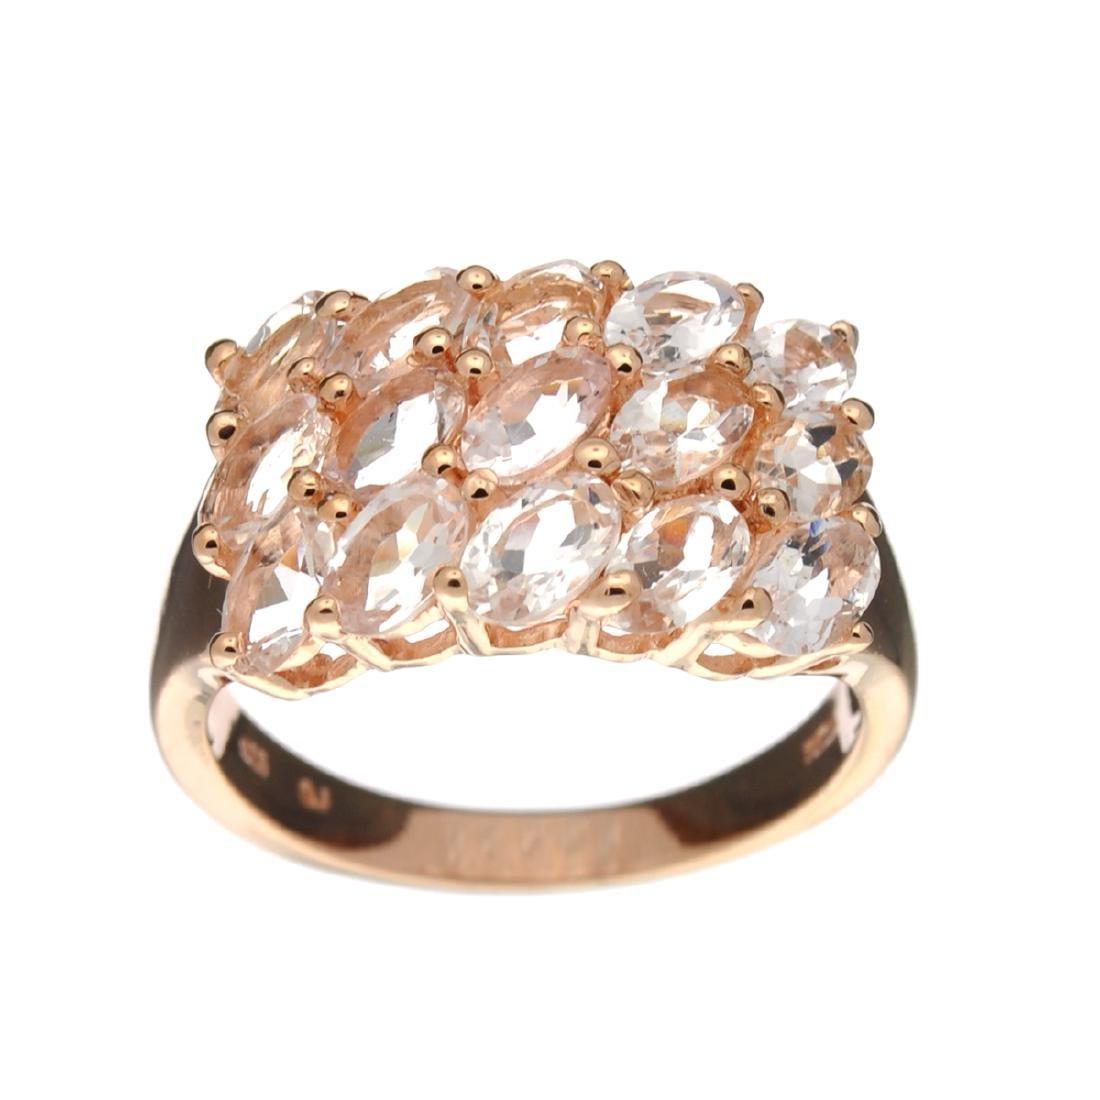 APP: 1.5k Fine Jewelry 2.60CT Oval Cut Morganite And